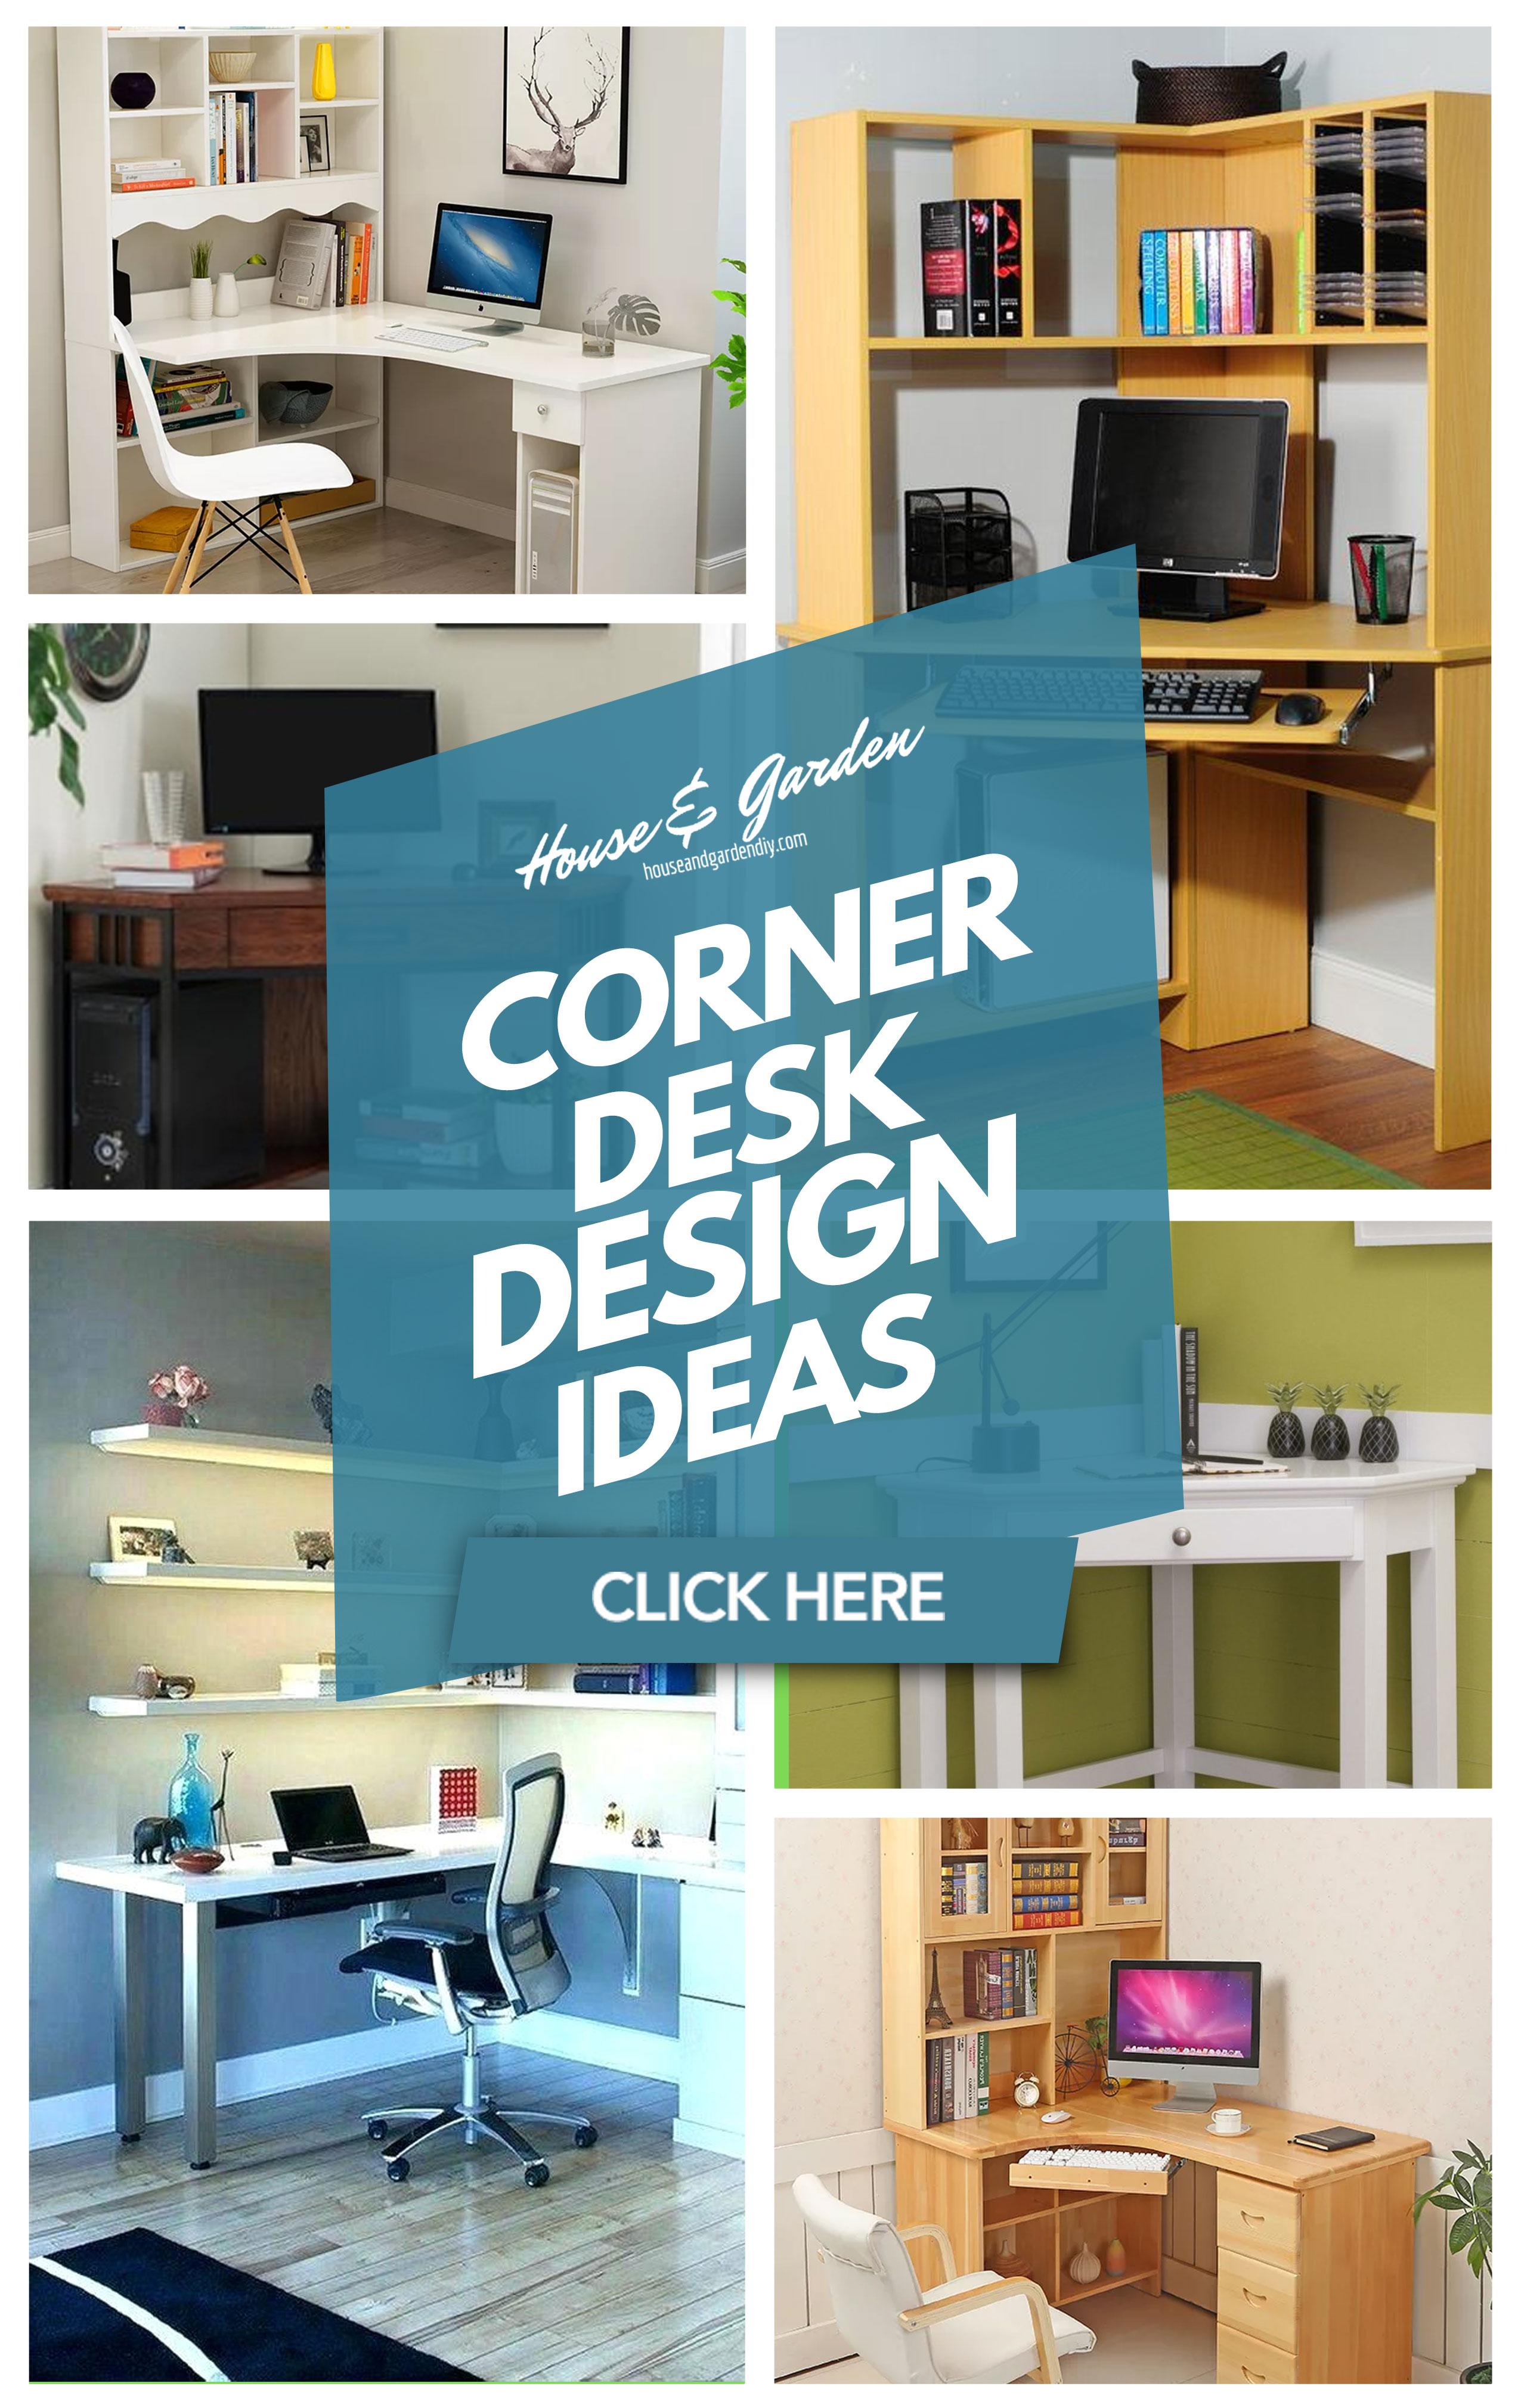 Cool 23 Corner Desk Ideas 2019 Trends Tips Benefits Cons Of Download Free Architecture Designs Embacsunscenecom